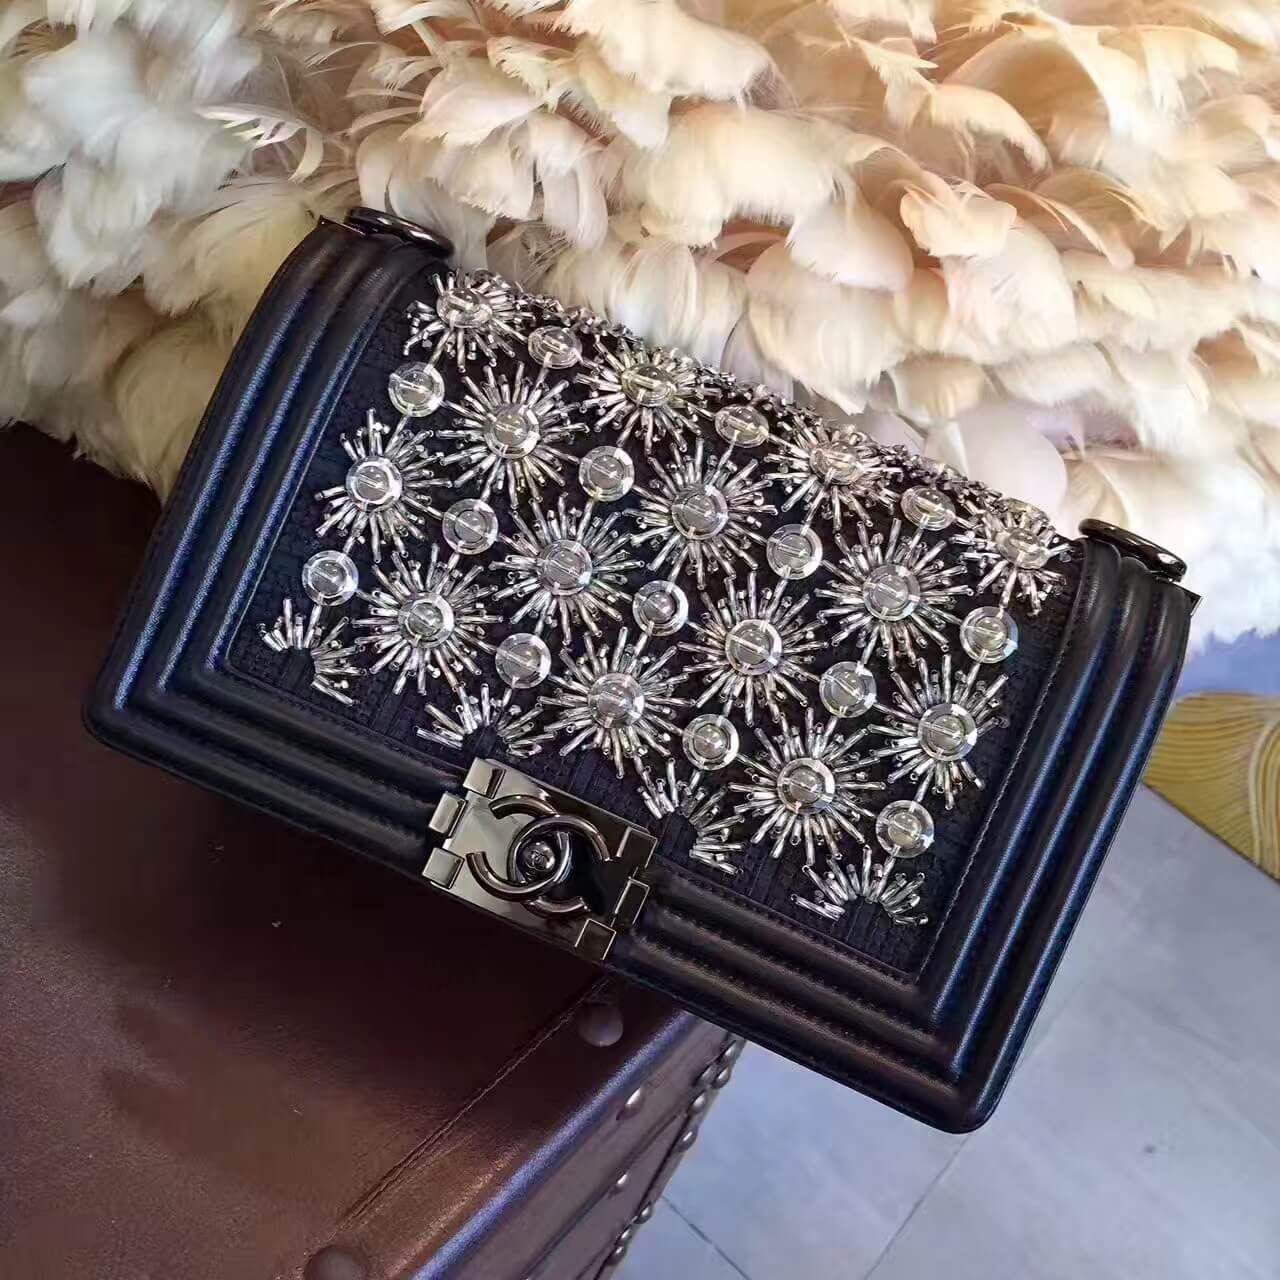 c60697bc8a01 Chanel Black Embroidered Satin/Led/Lambskin with Black Metal Medium Boy  Chanel Flap Bag